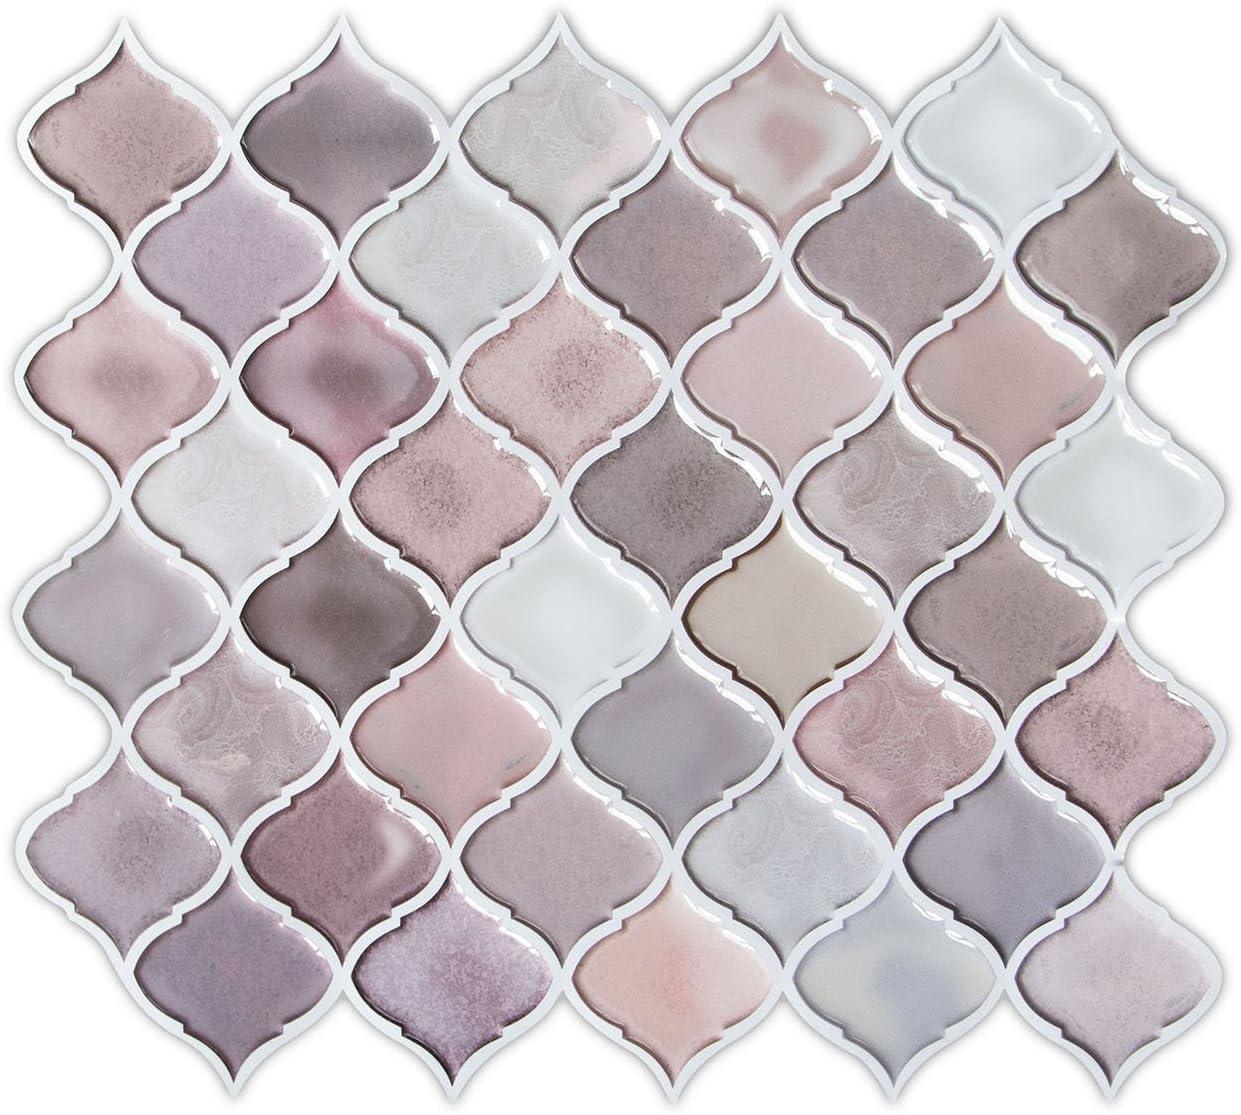 Peel And Stick Tile Hue Decoration Pink Arabesque Tile Backsplash For Kitchen Decorative Self Adhesive Backsplash Tile 10 X11 Pack Of 6 Amazon Com